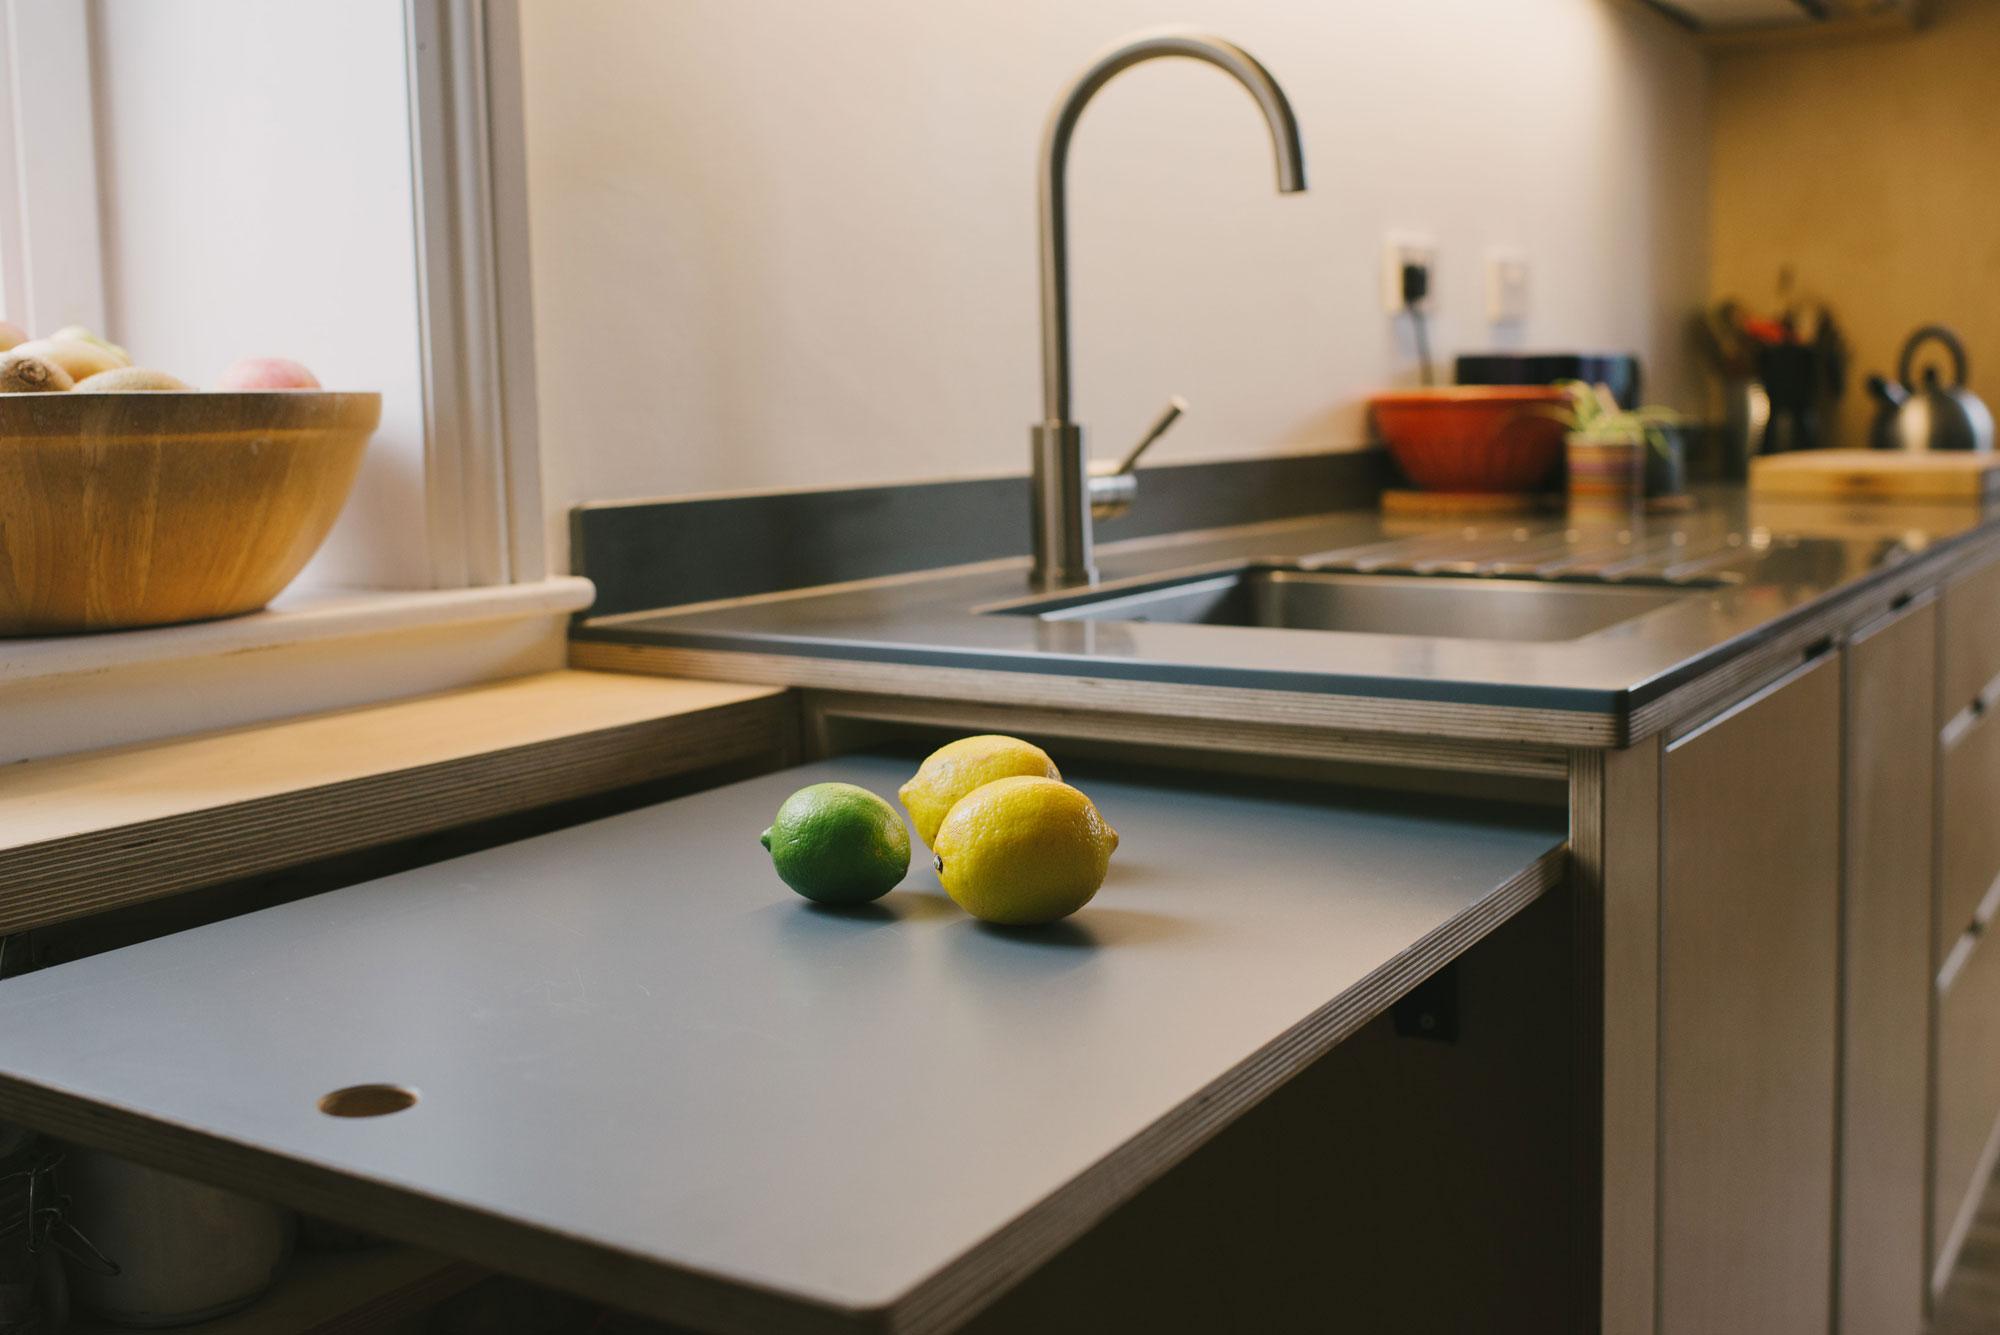 Birch ply kitchen extending worksurface